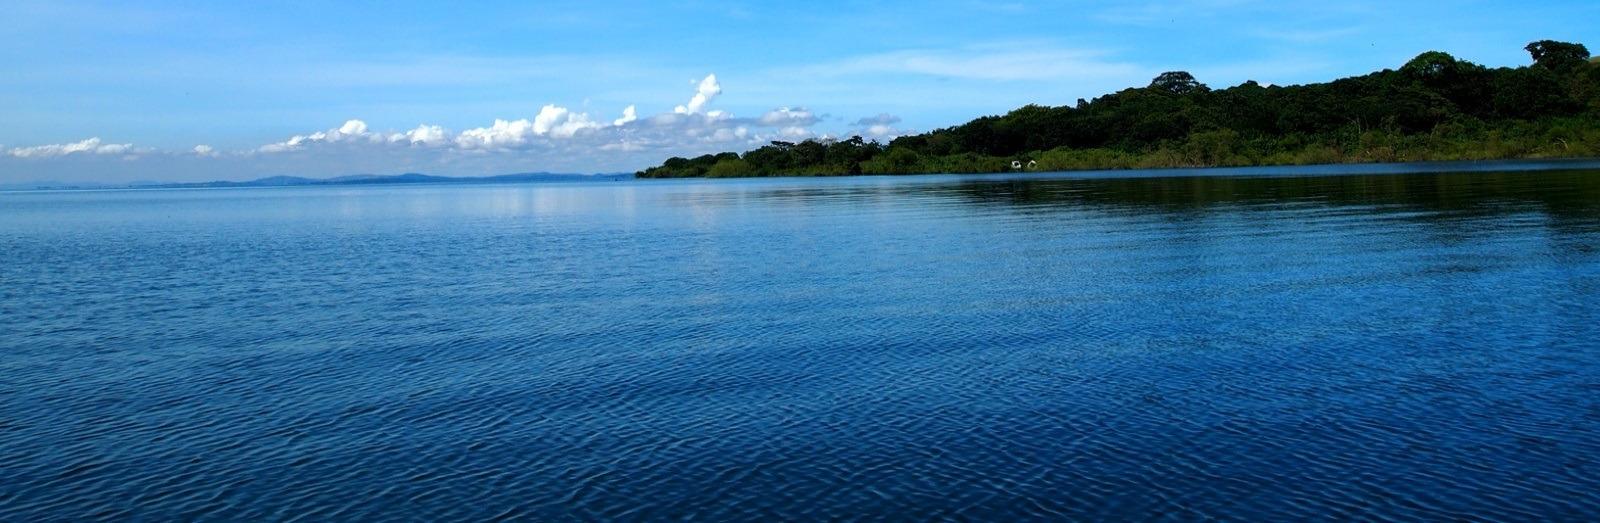 Lake-Victoria_Uganda